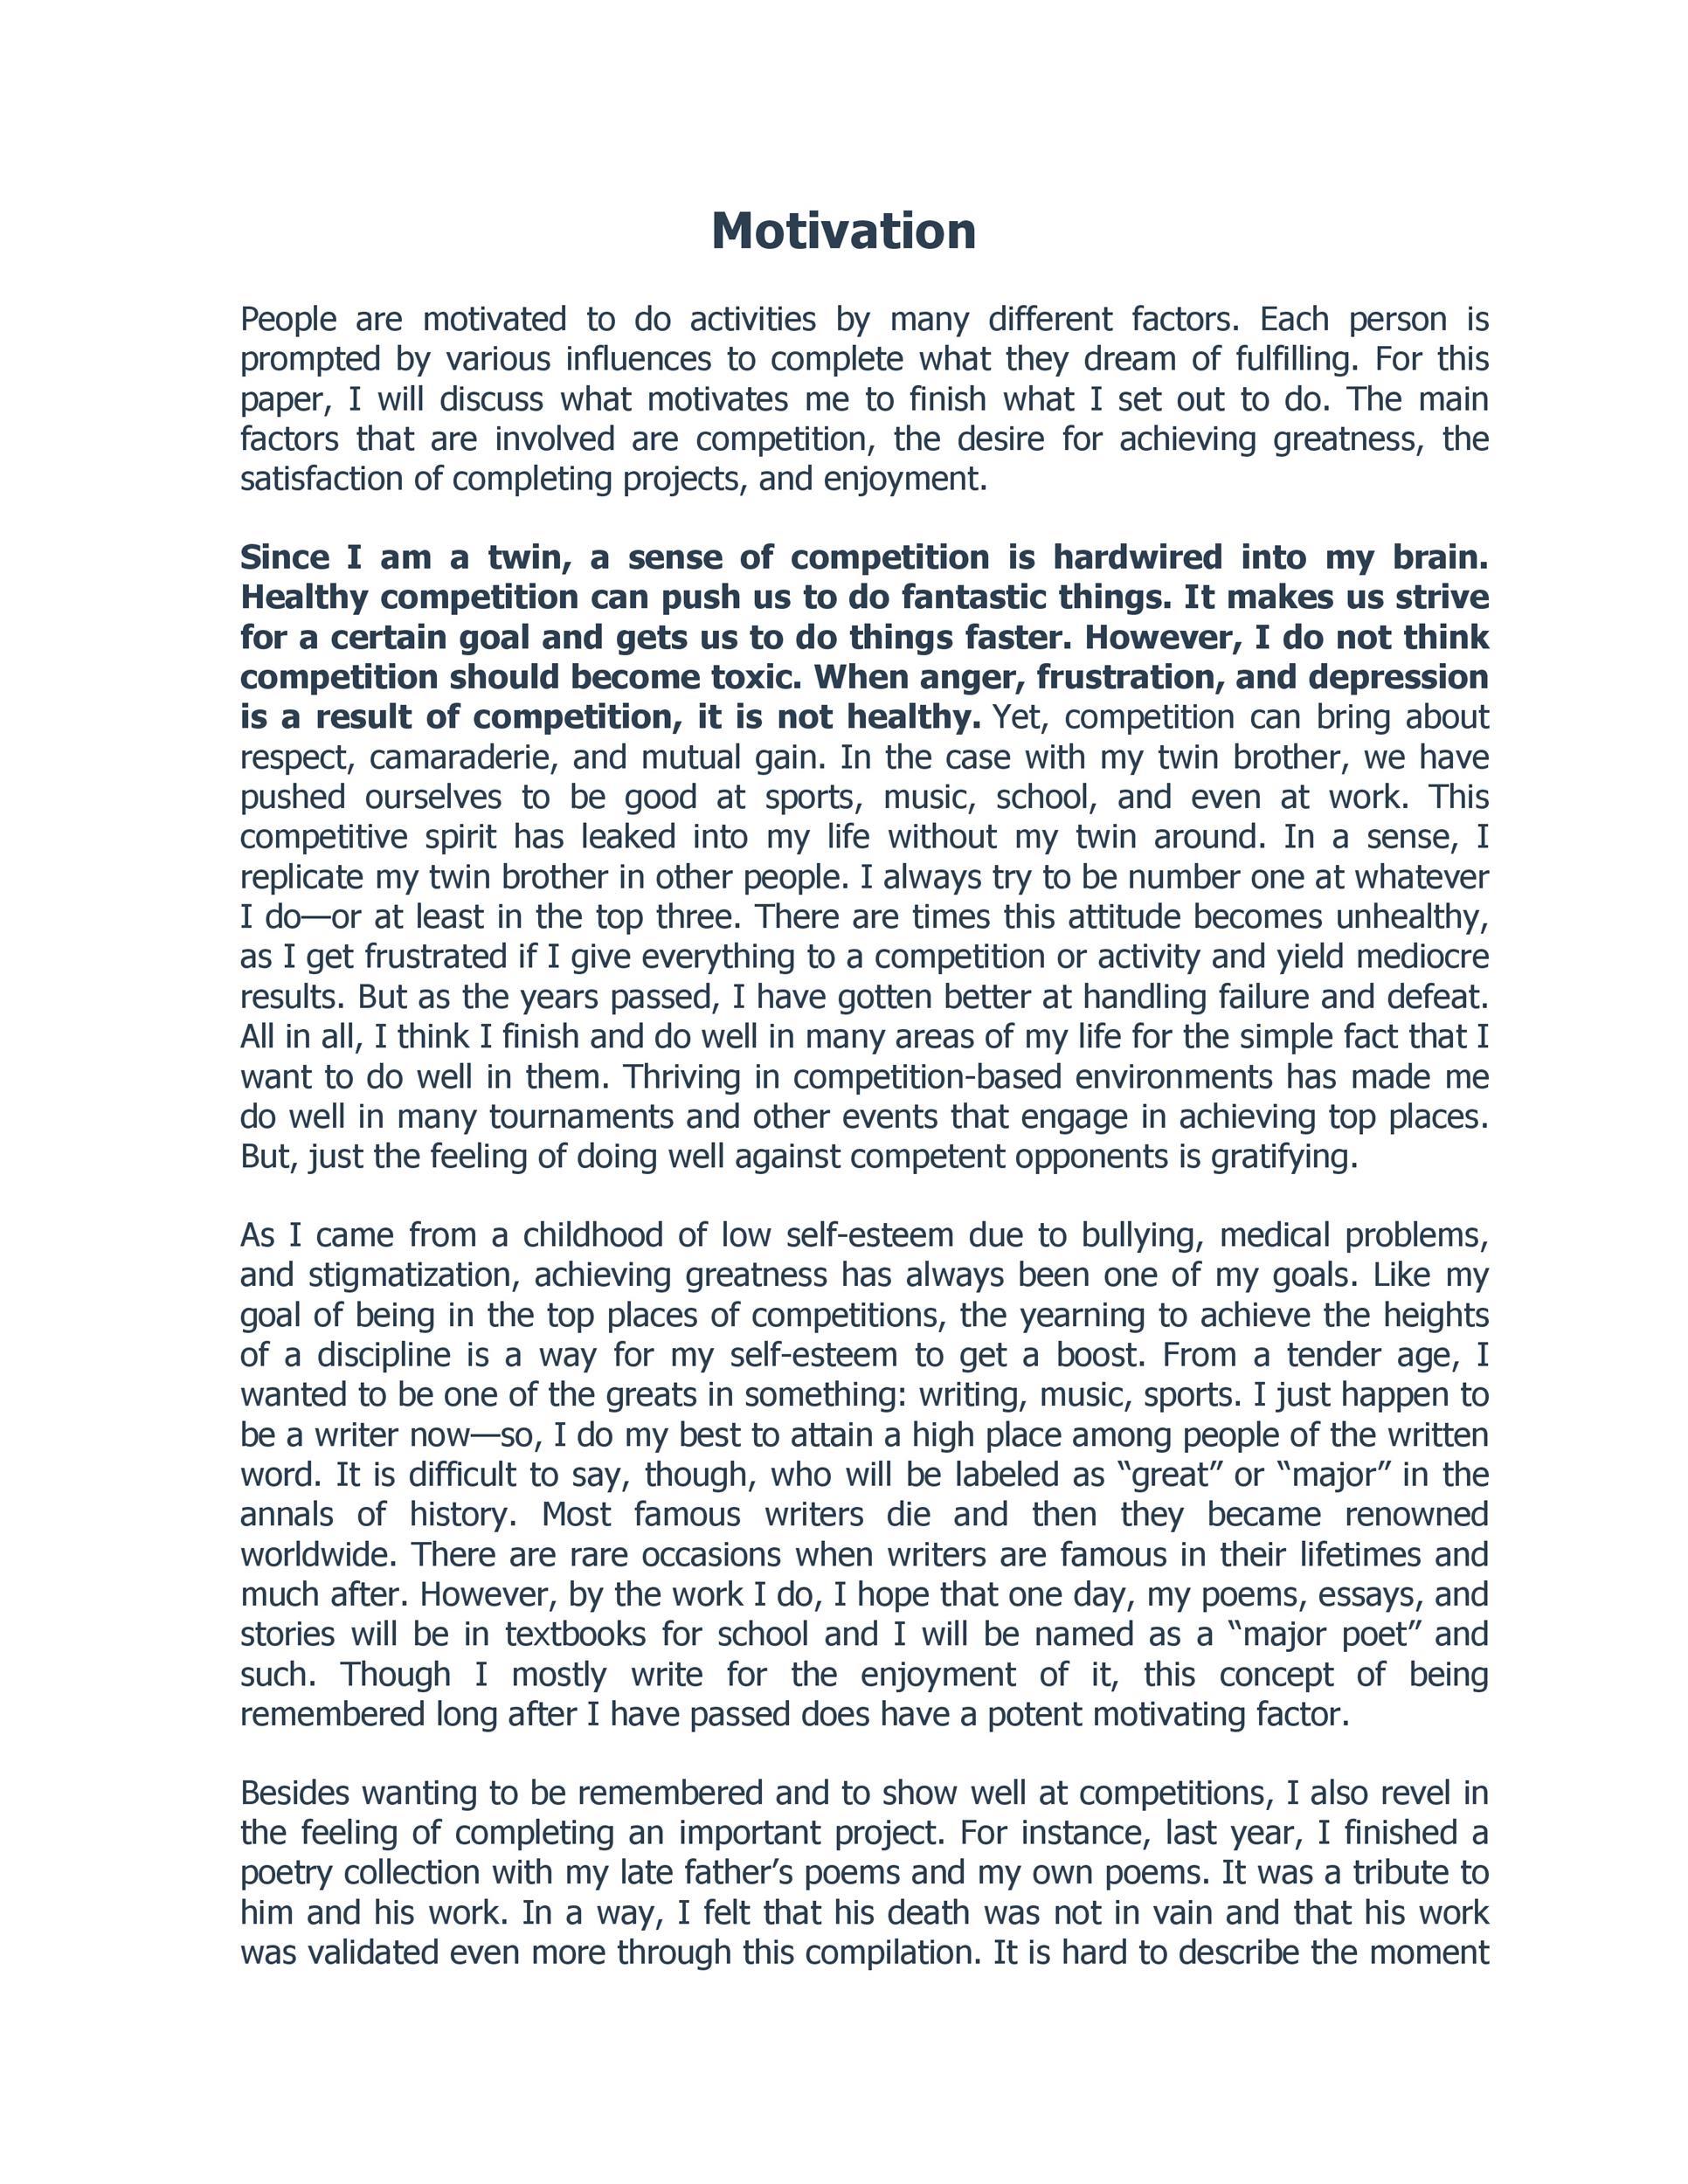 Free reflective essay example 48